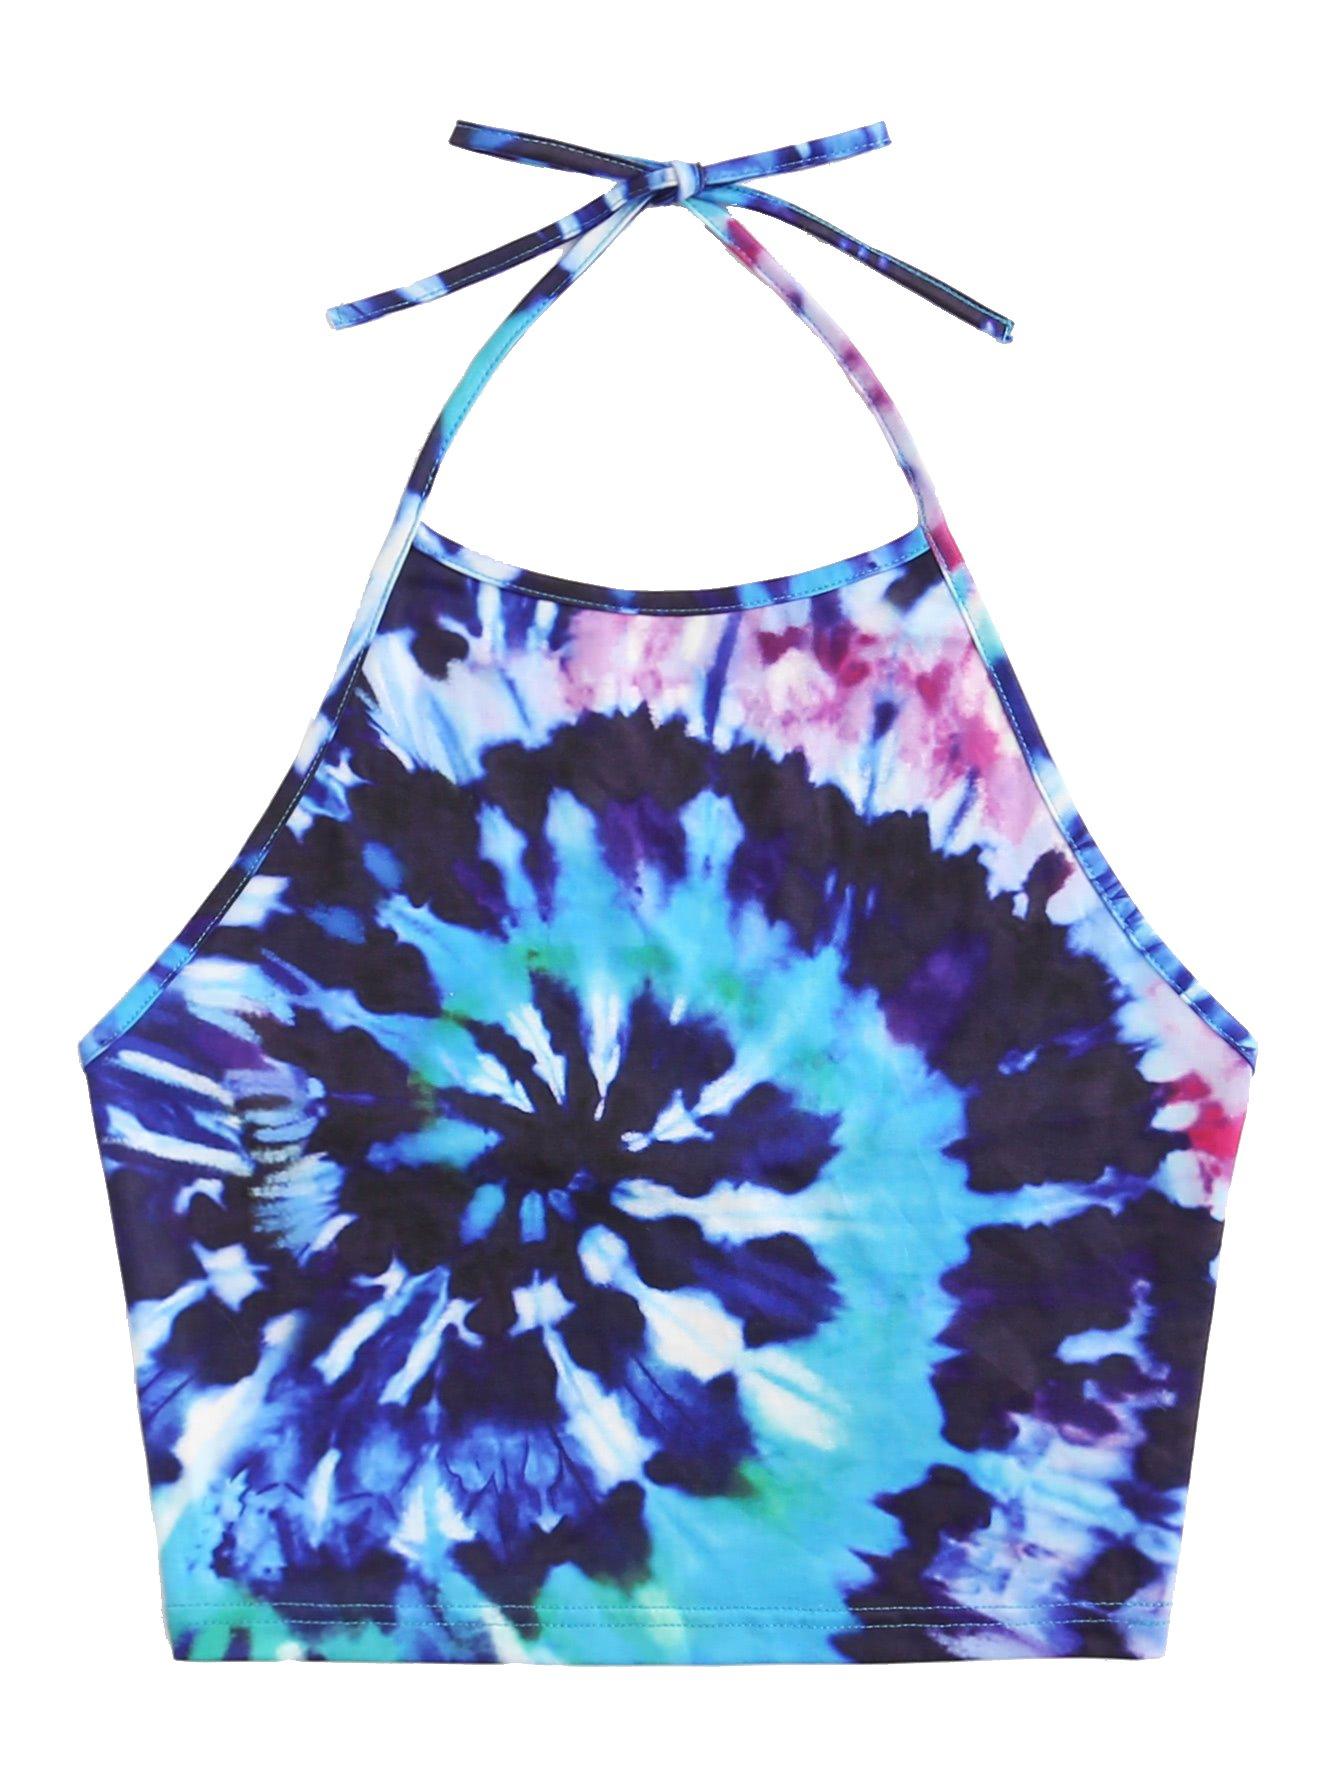 Romwe Women's Sexy Spiral Tie Dye Multicolor Print Backless Tie Halter Top Blue M